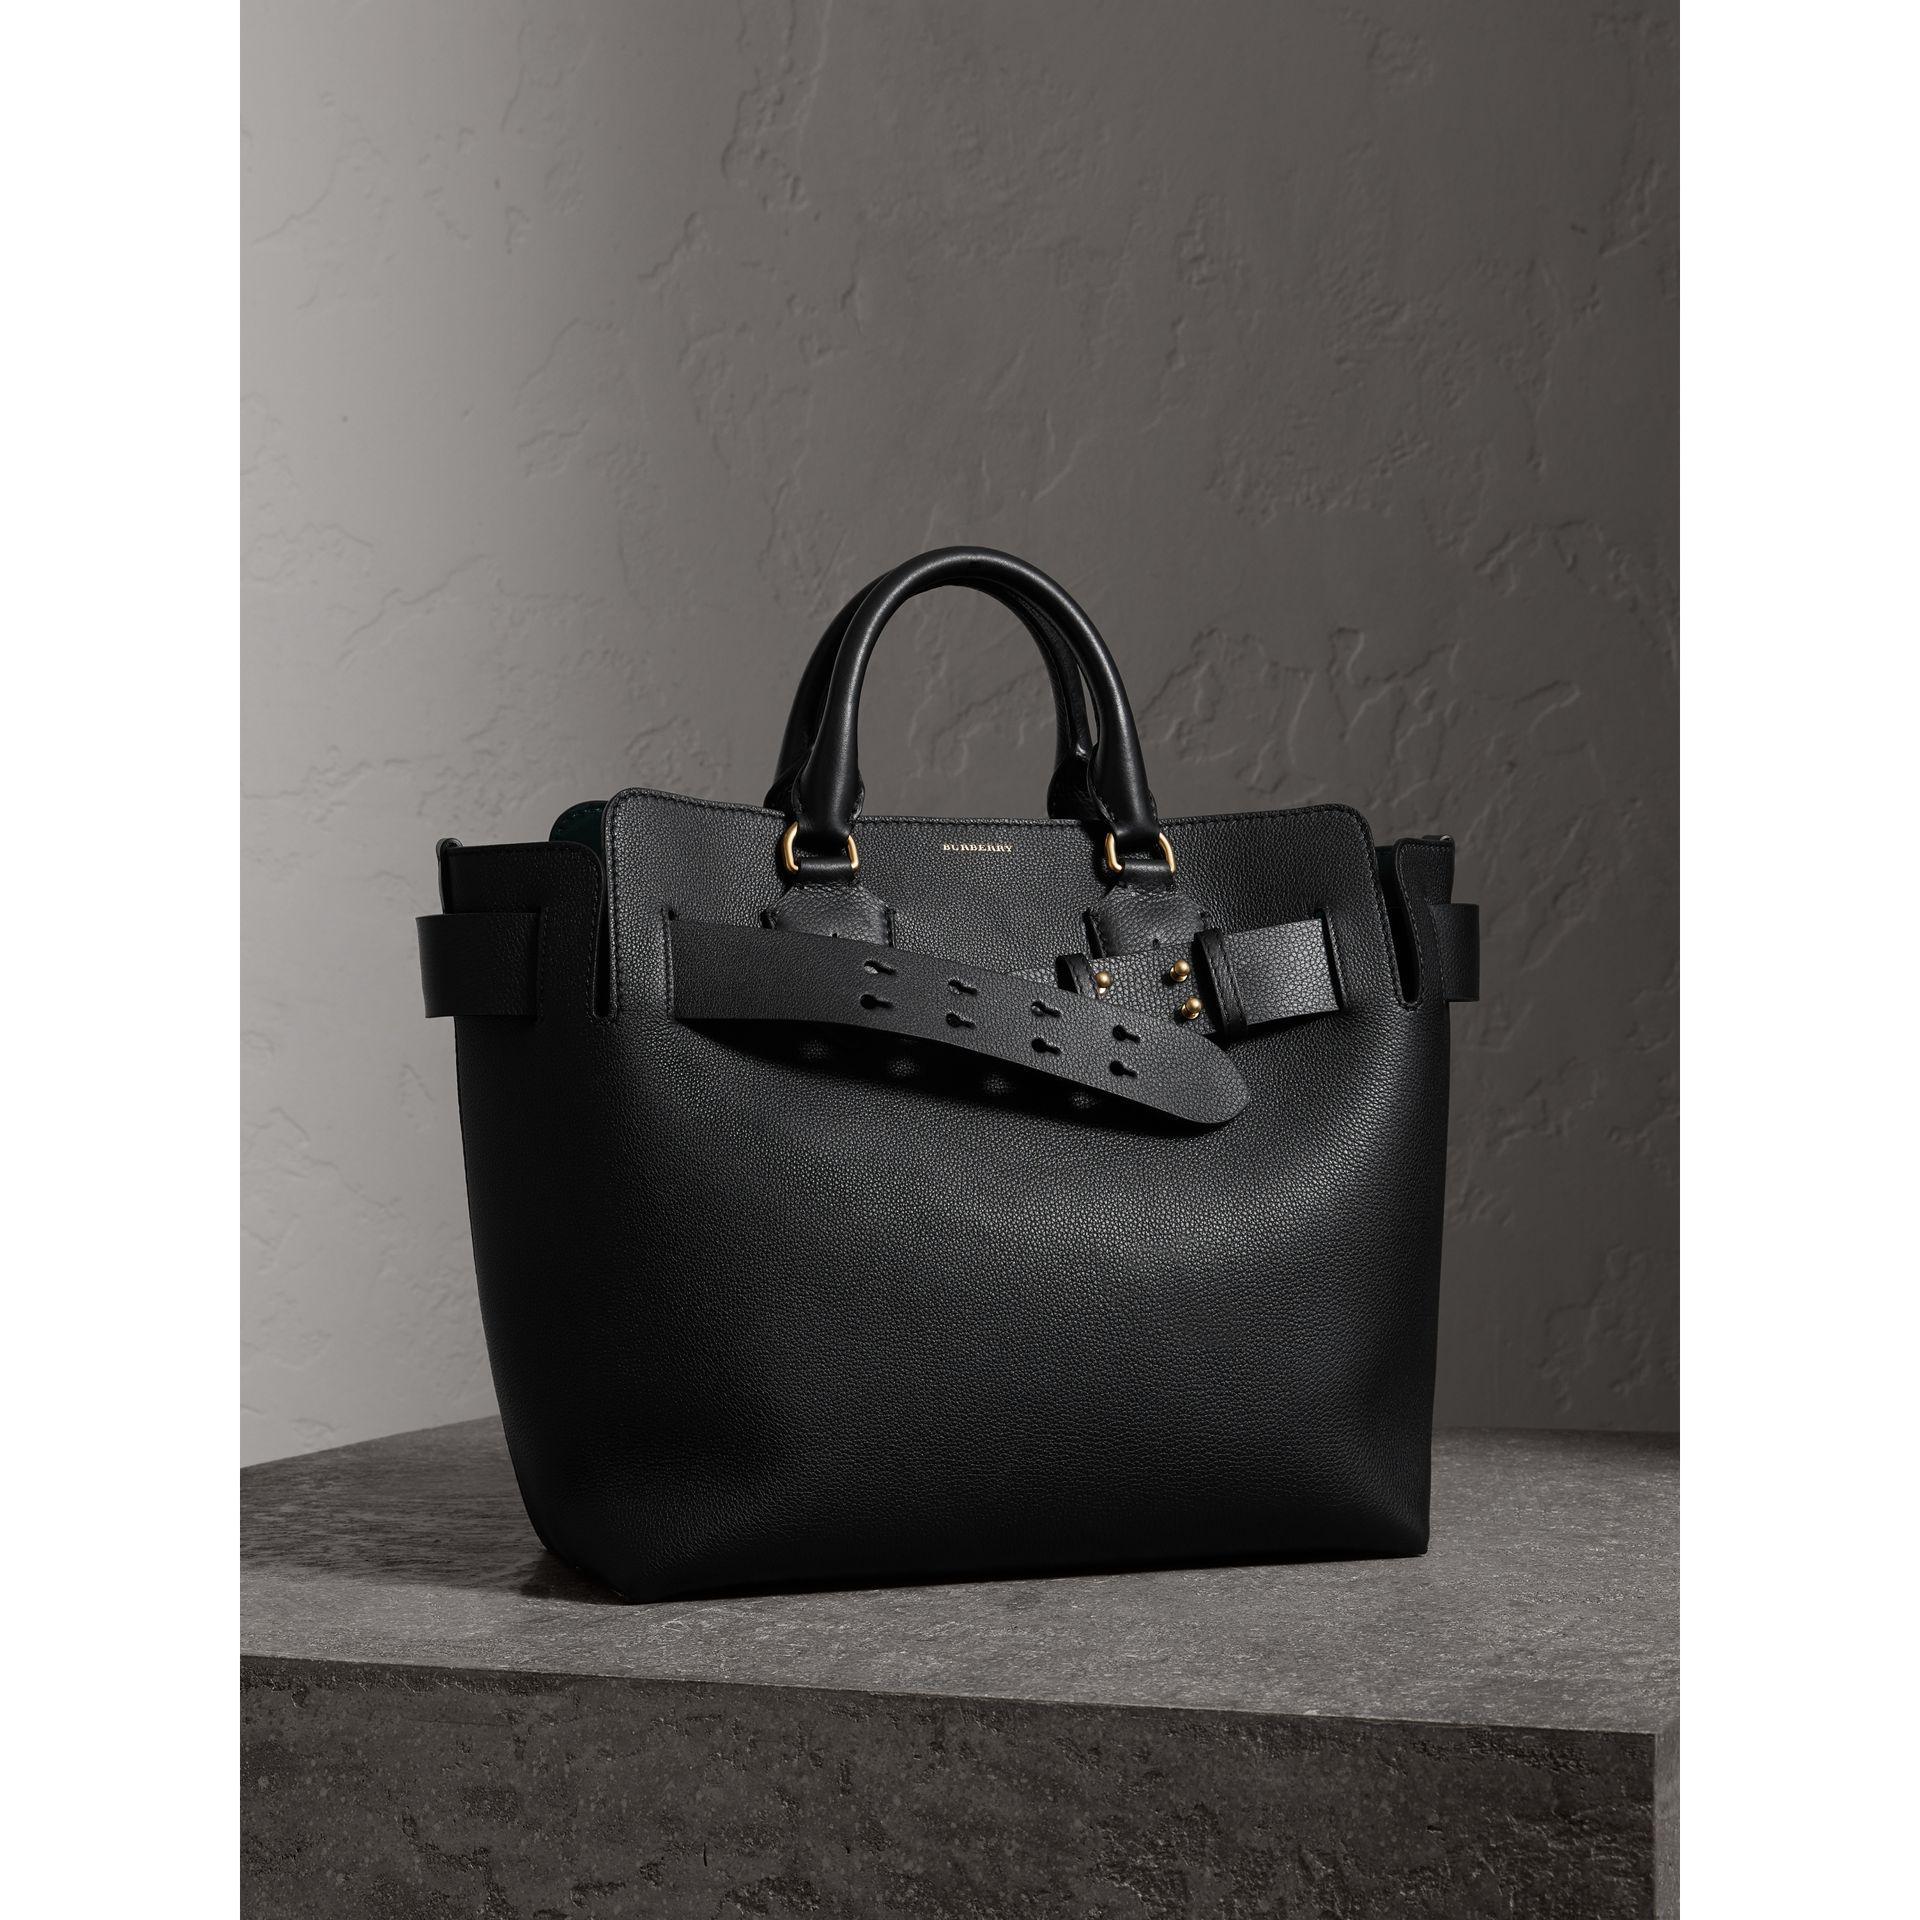 21b7bd3b7dde Lyst - Burberry The Medium Leather Belt Bag in Black